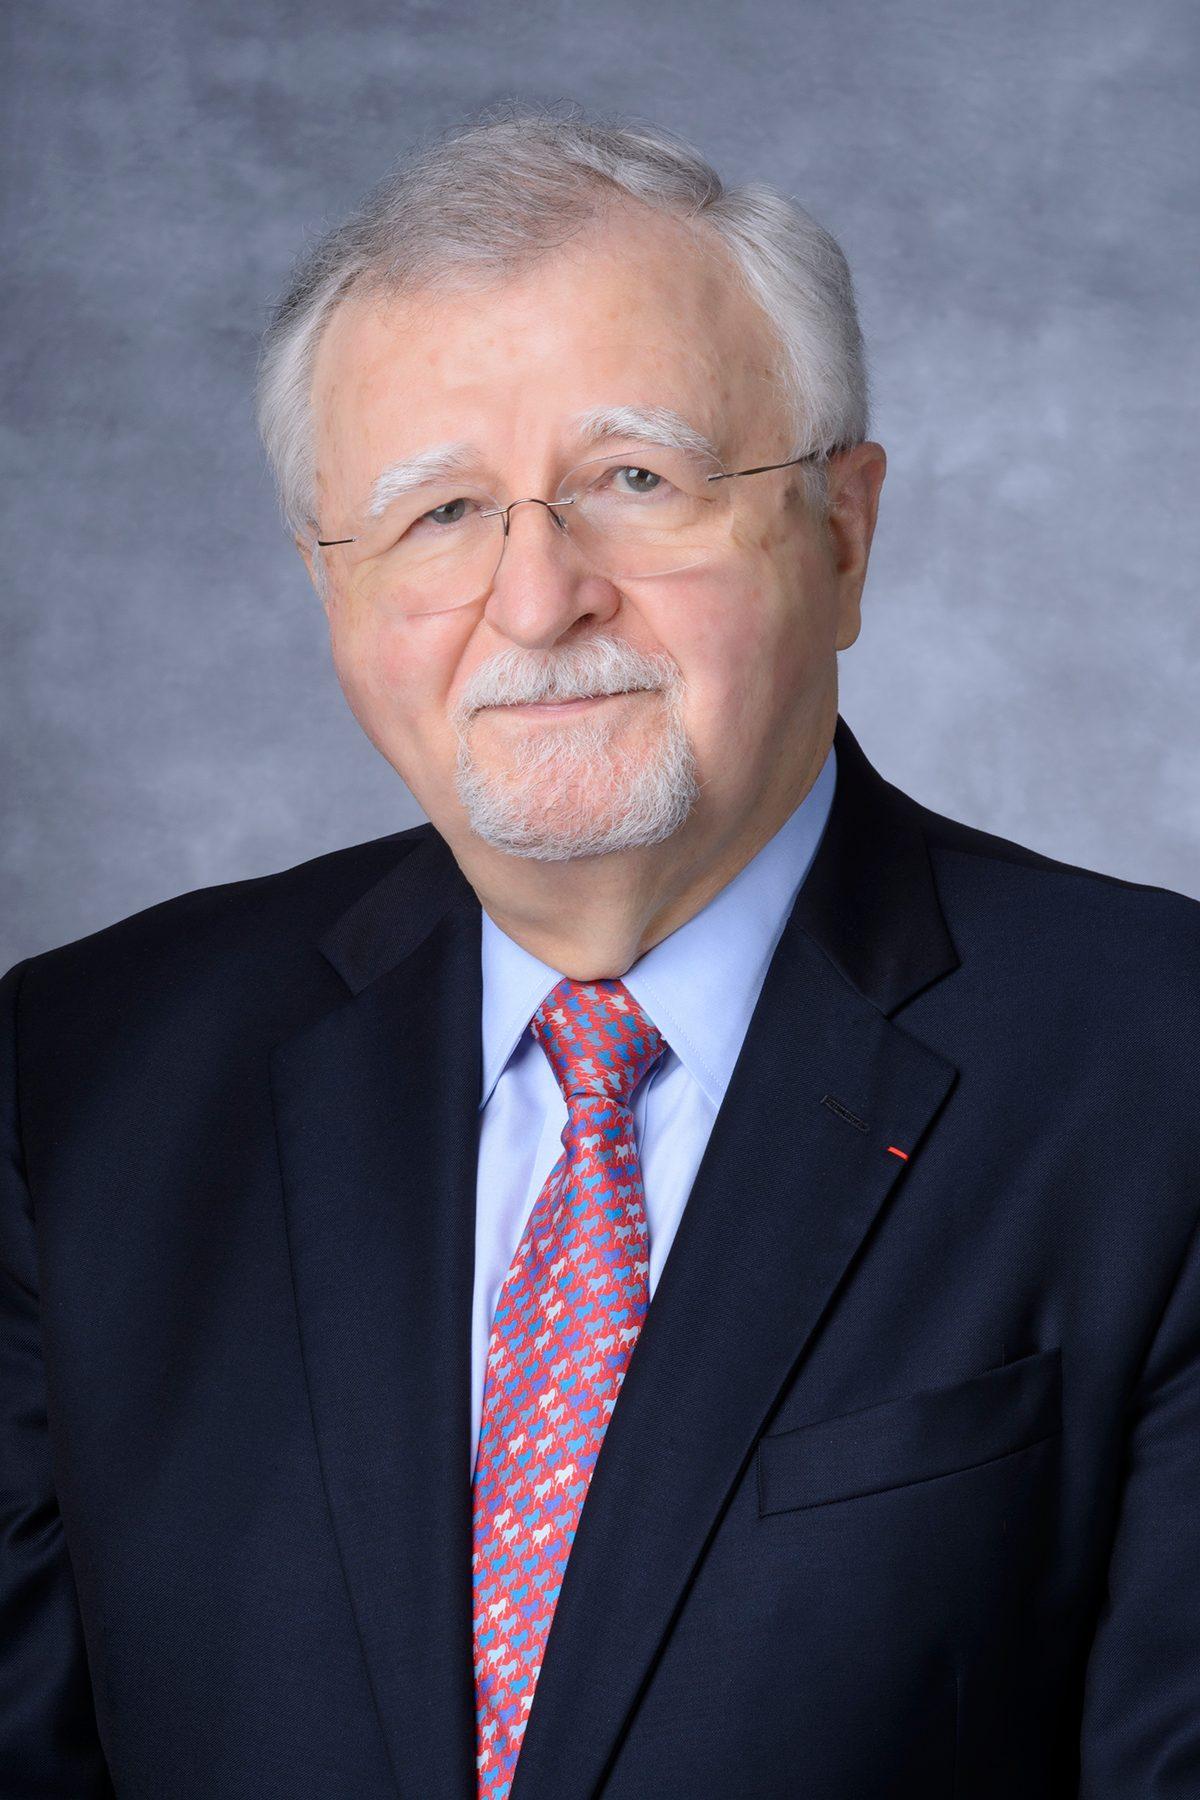 Prof. Gabriel Hortobagyi